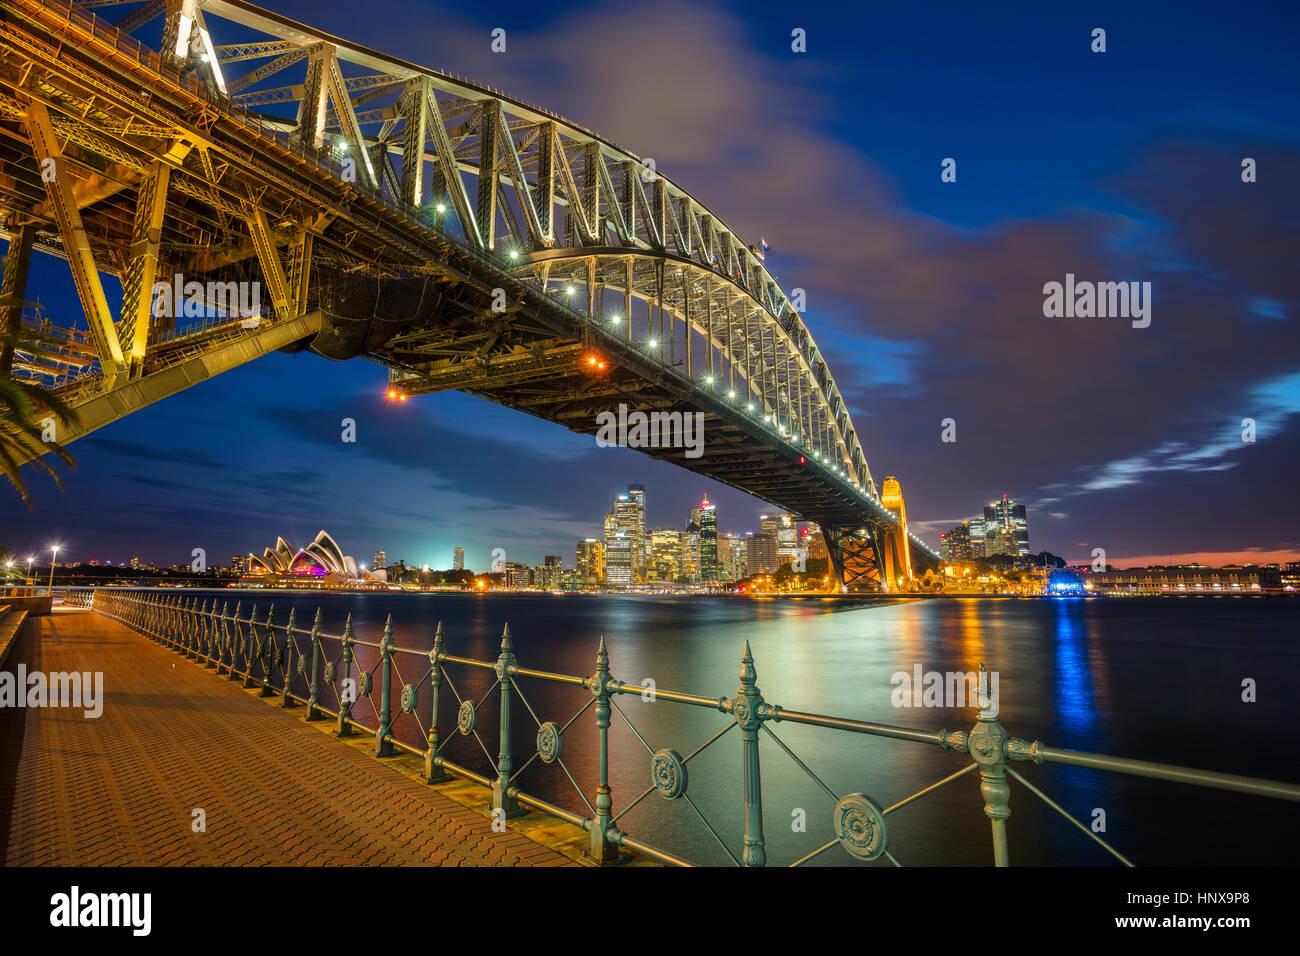 Sydney. Cityscape image of Sydney, Australia with Harbour Bridge during twilight blue hour. - Stock Image